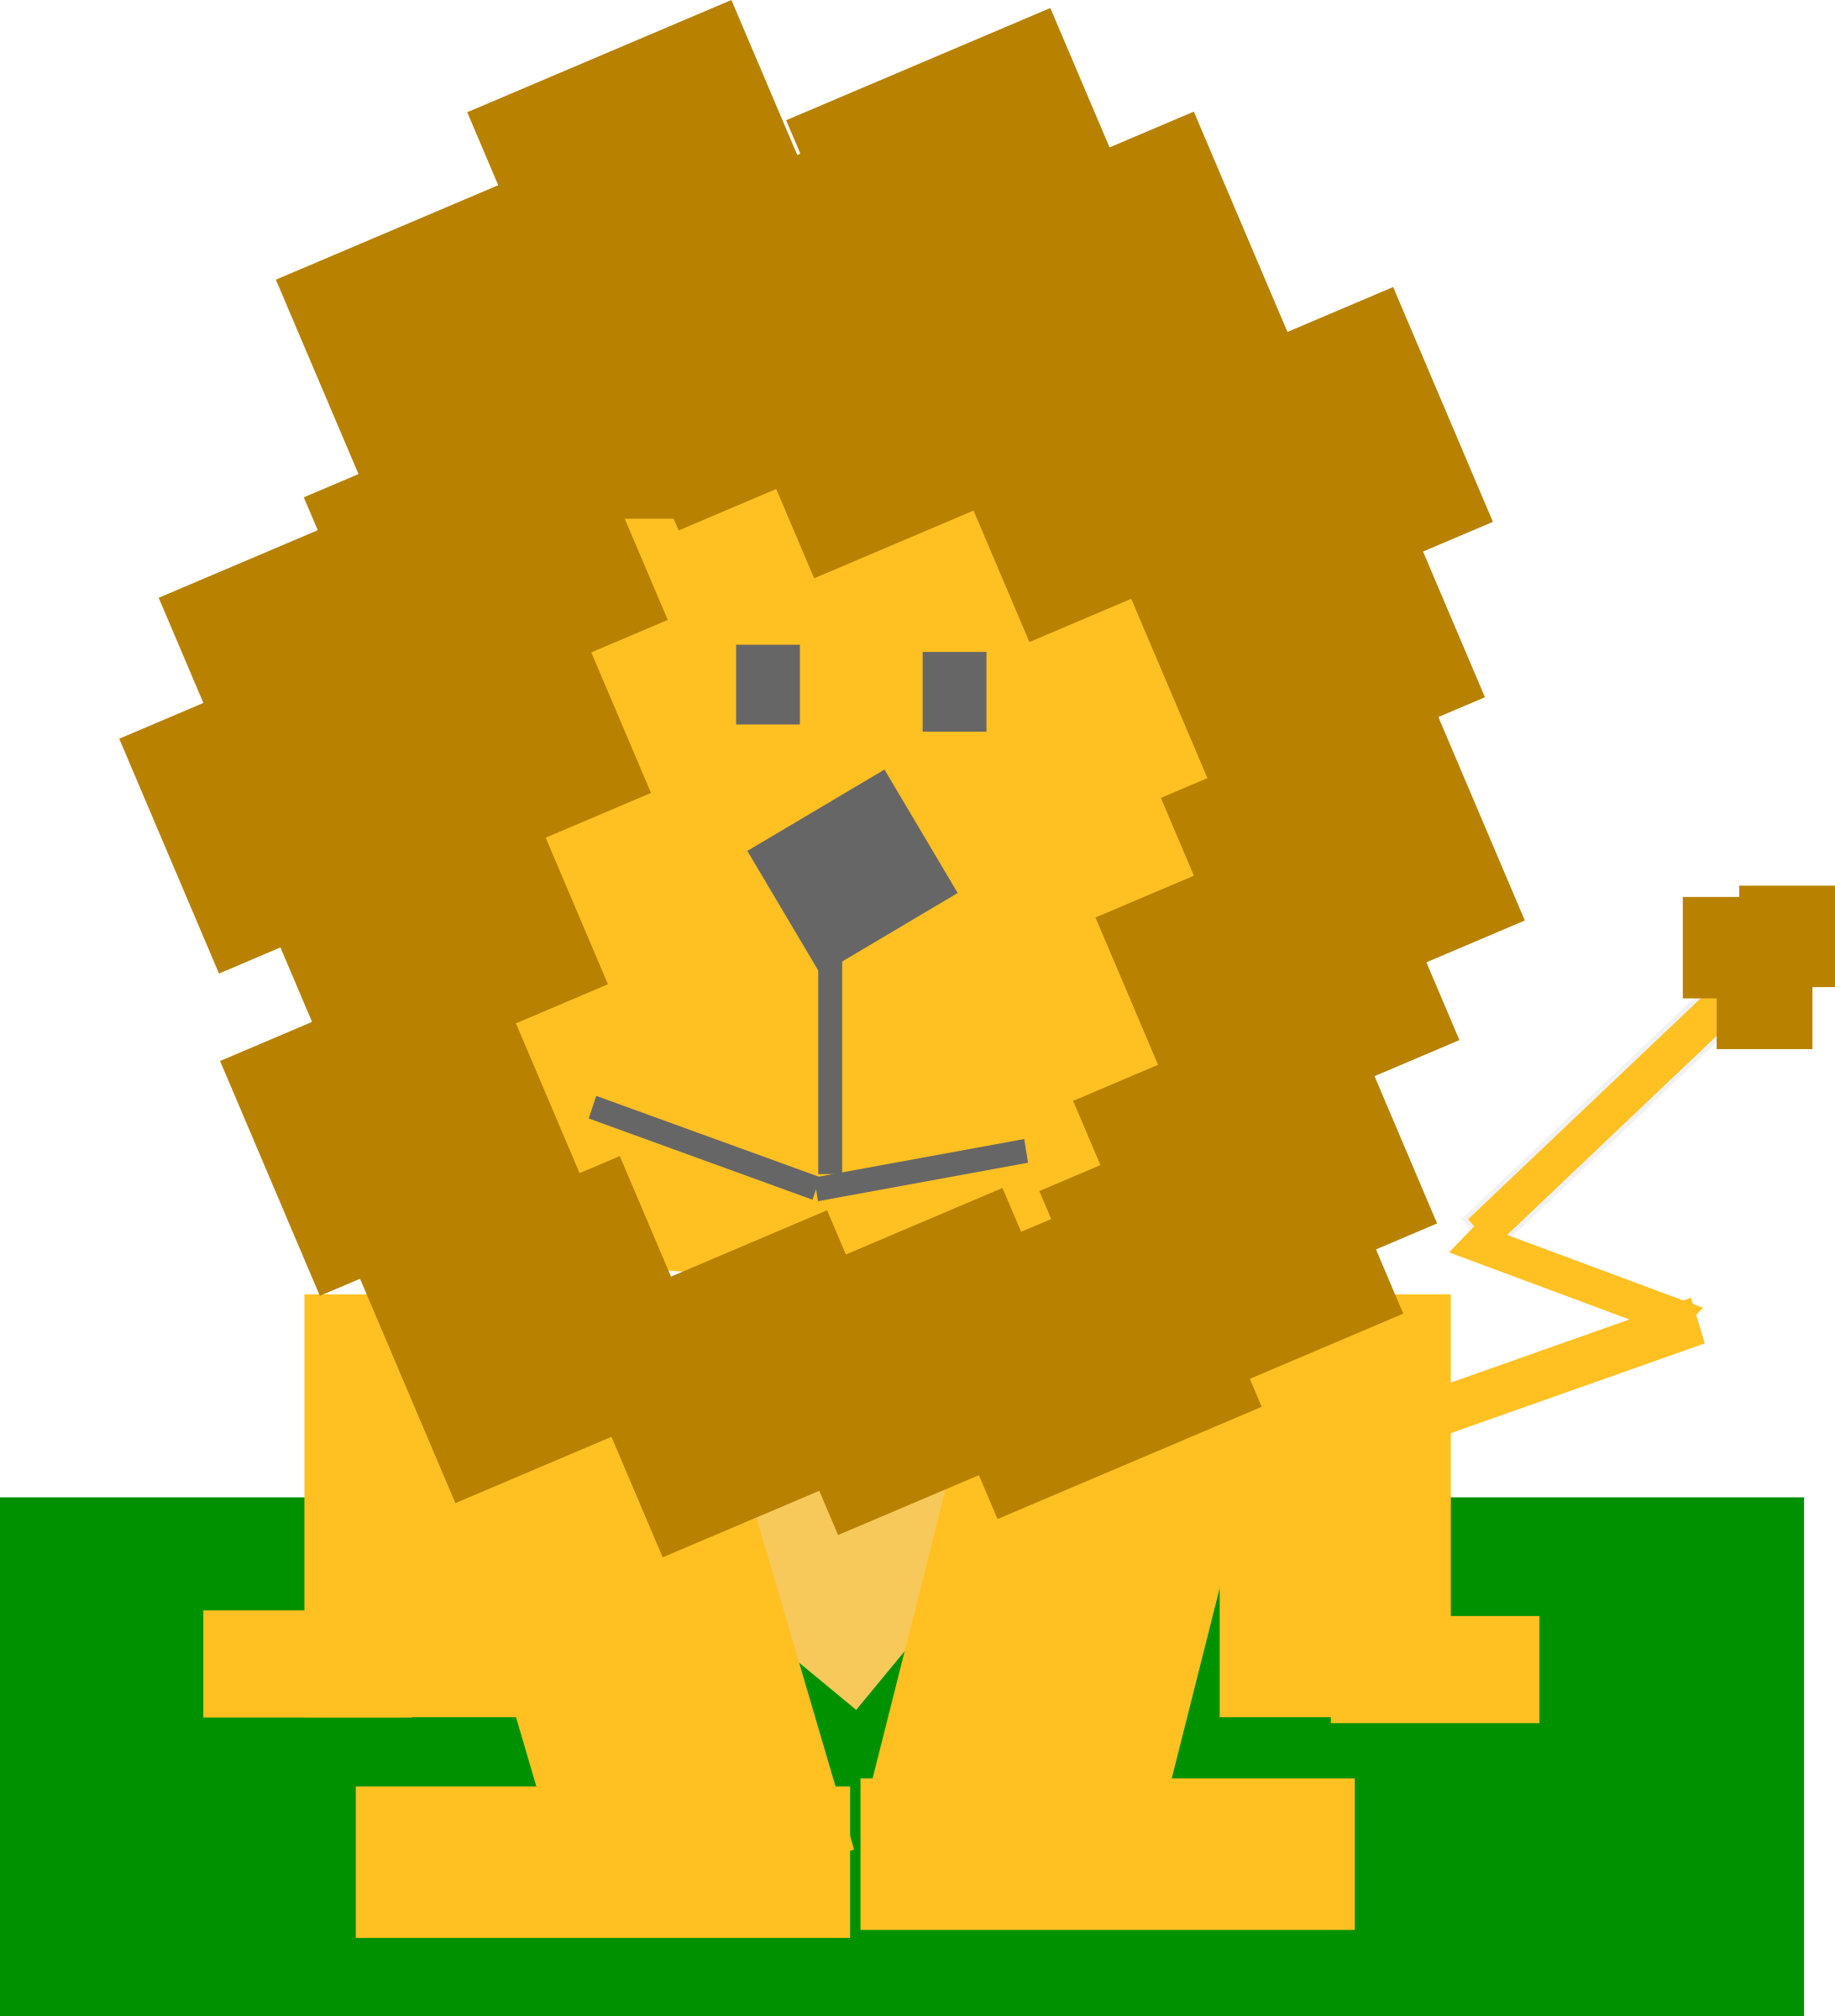 Square clipart cartoon Square Clipart Square animal lion